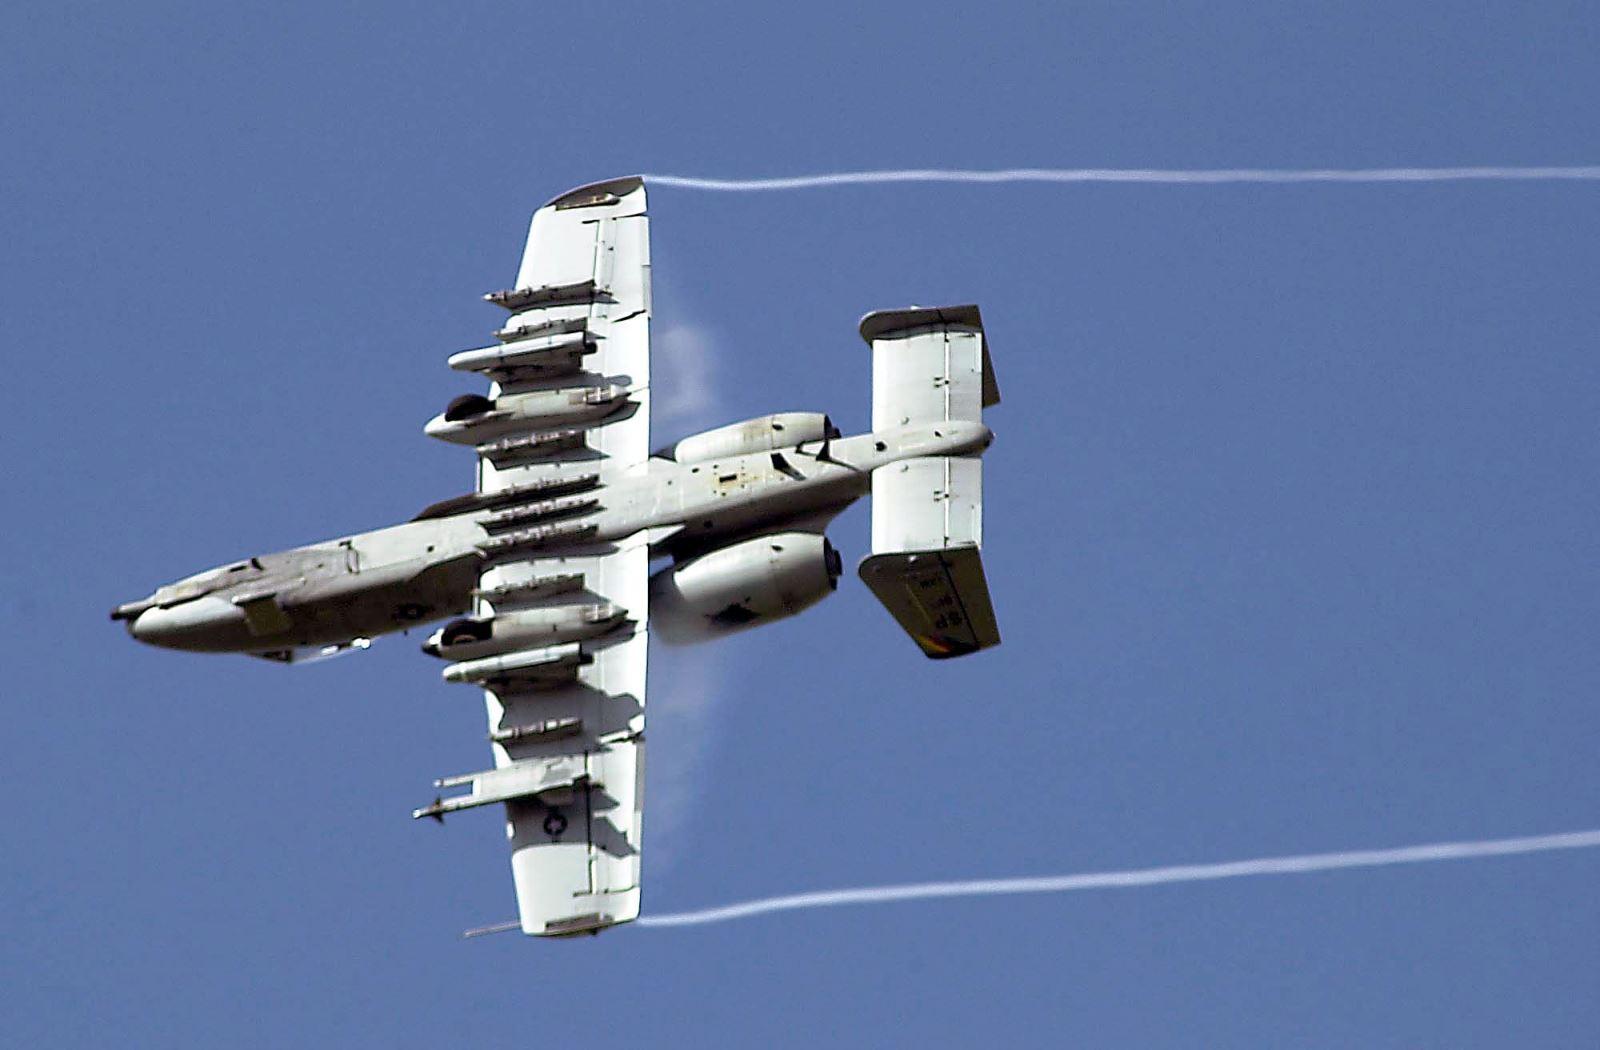 Máy bay A-10 Thunderbolt II. Ảnh: USAF